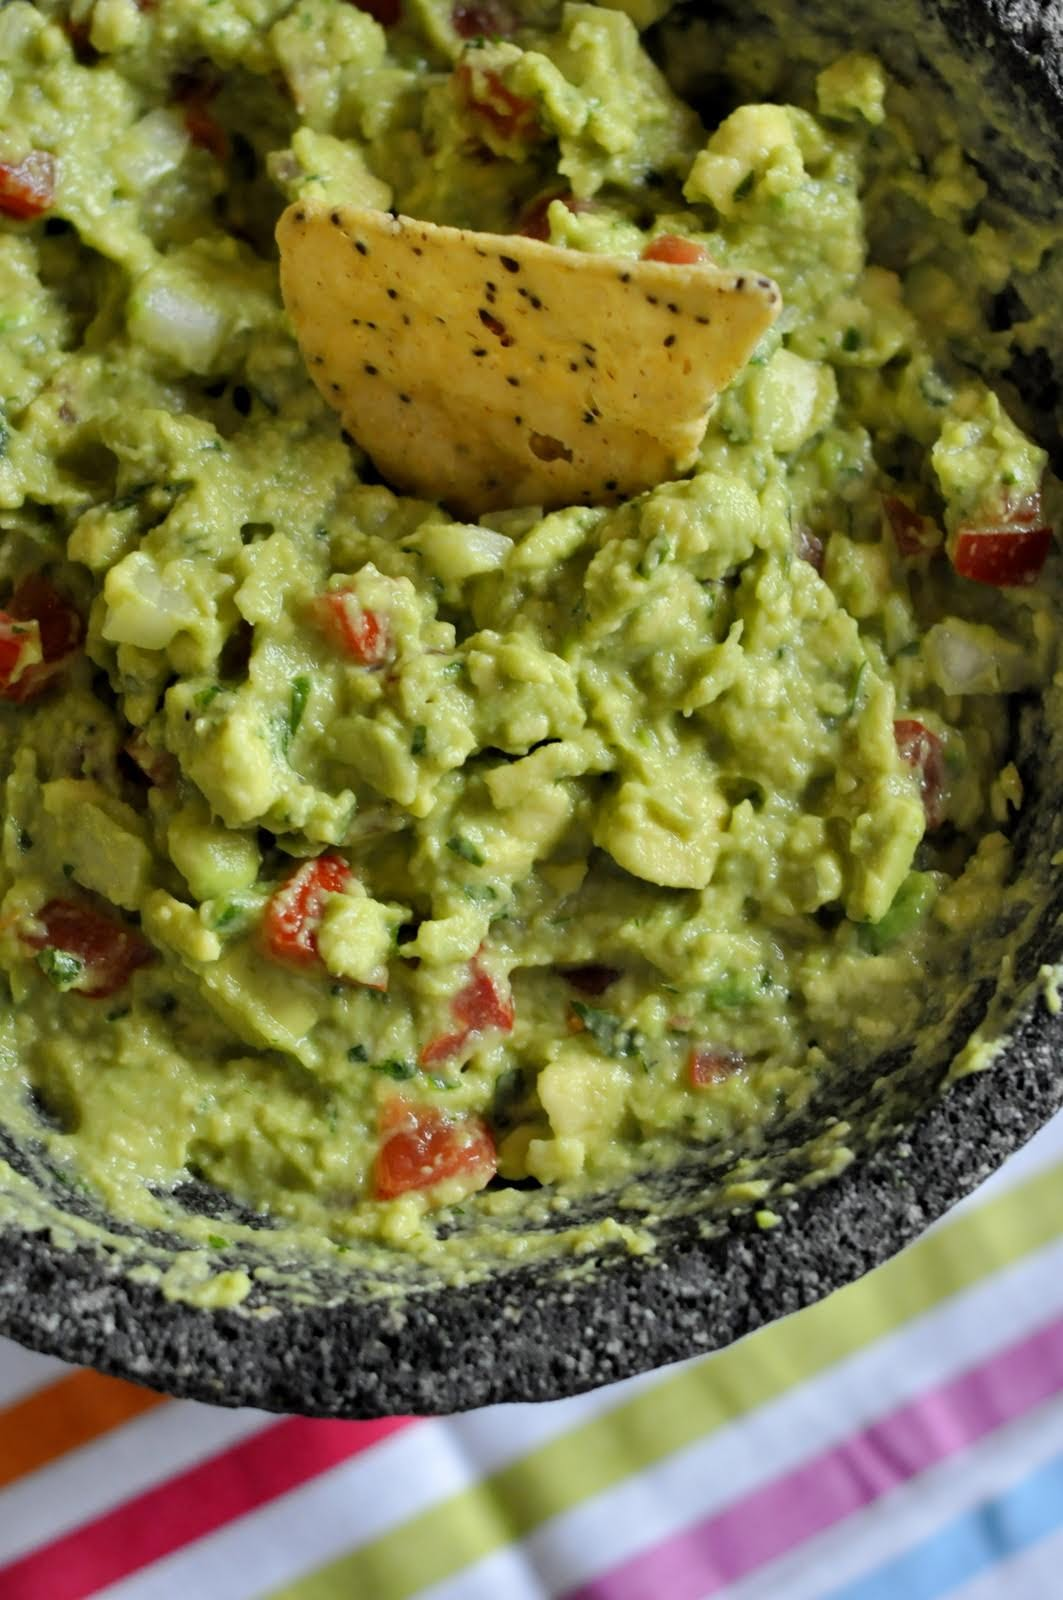 Signature Guacamole from Rosa Mexicano | Taste As You Go